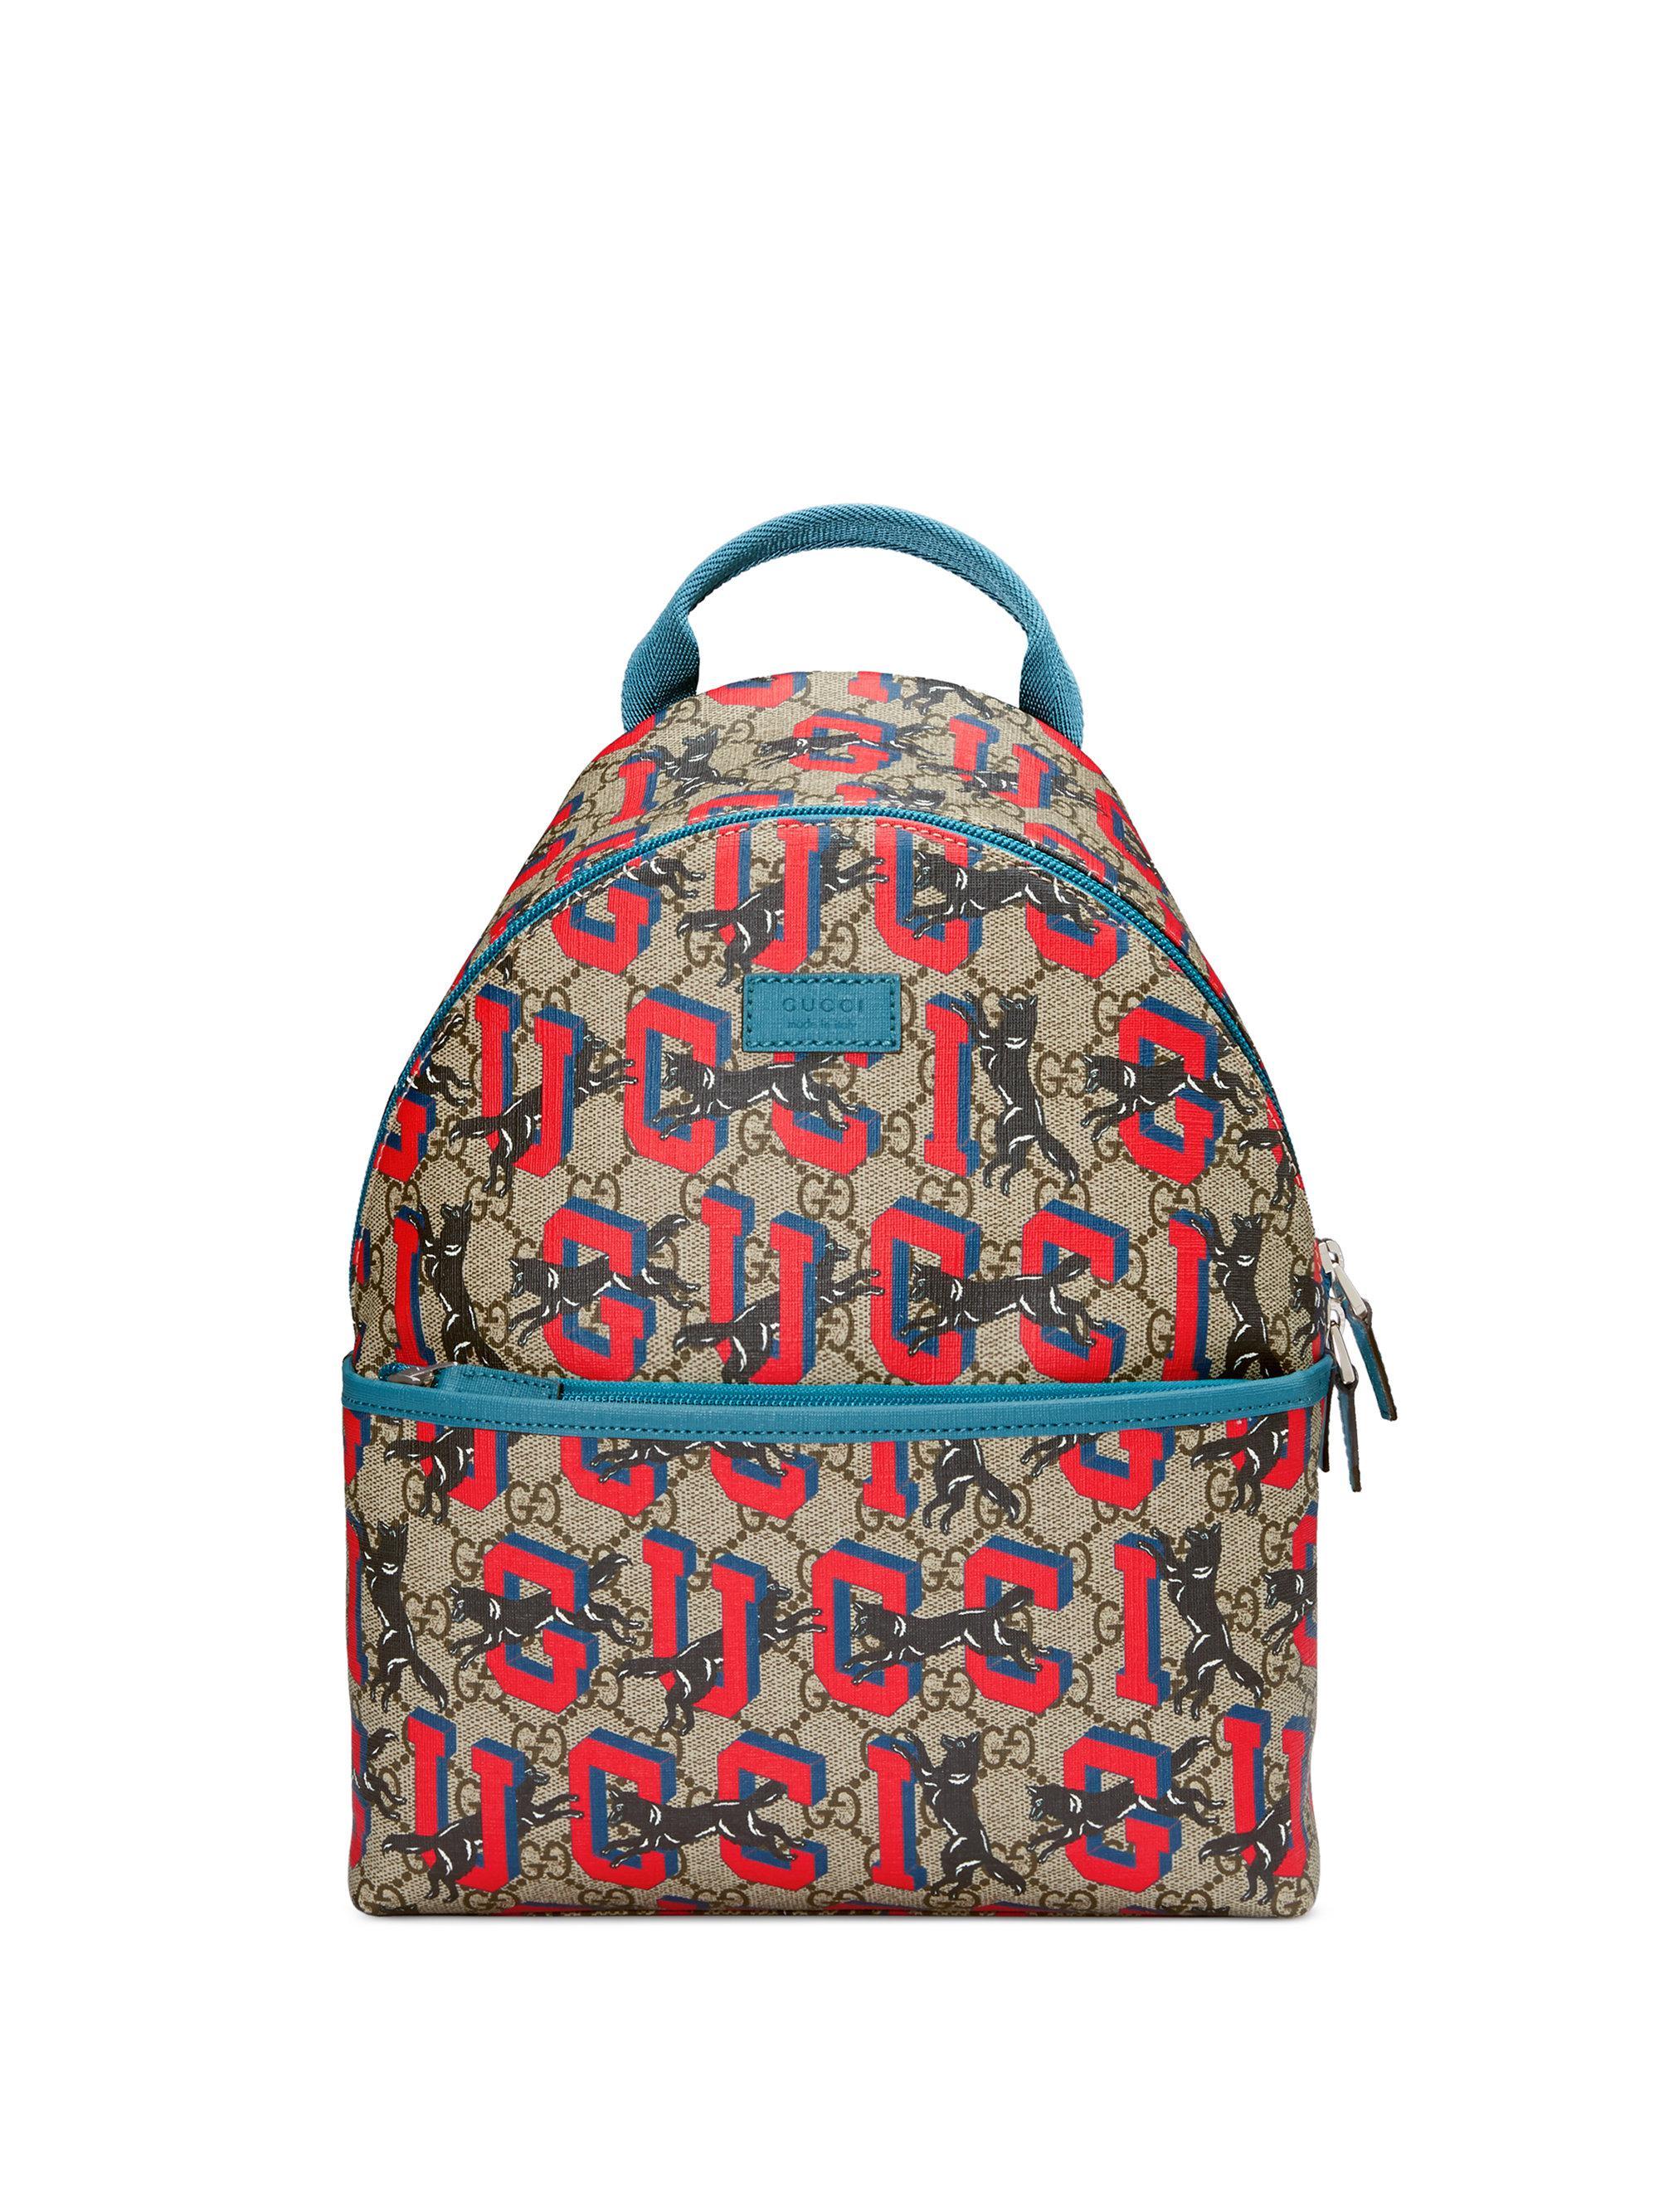 08f5f9eef04 Gucci Kid's Graffiti Print Logo Back Backpack in Red - Lyst